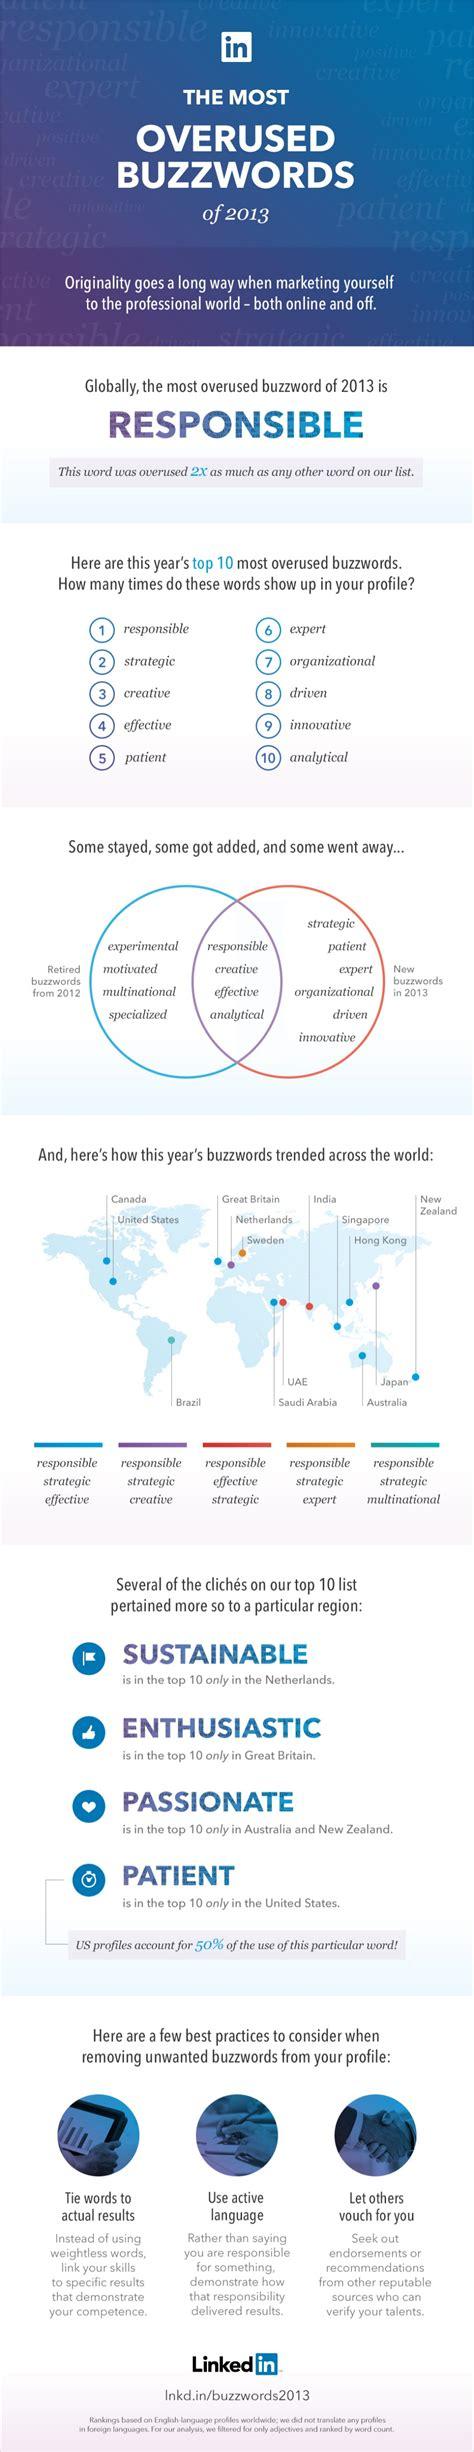 Resume Profile Buzzwords Infographic Linkedin Buzzwords